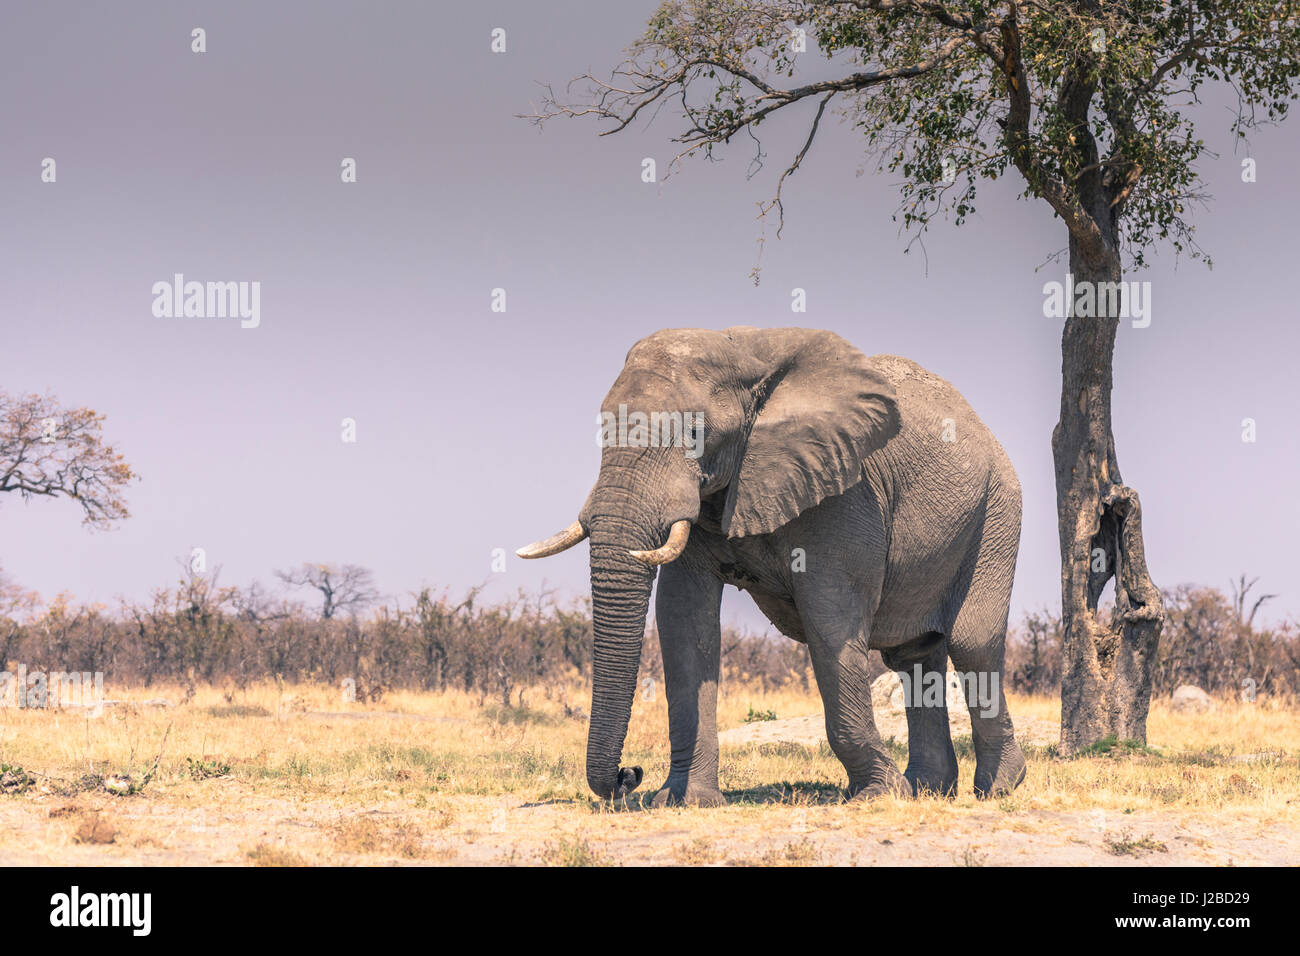 Botswana. Chobe National Park. Savuti. Elephant (Loxodonta africana) walking towards a water hole. - Stock-Bilder